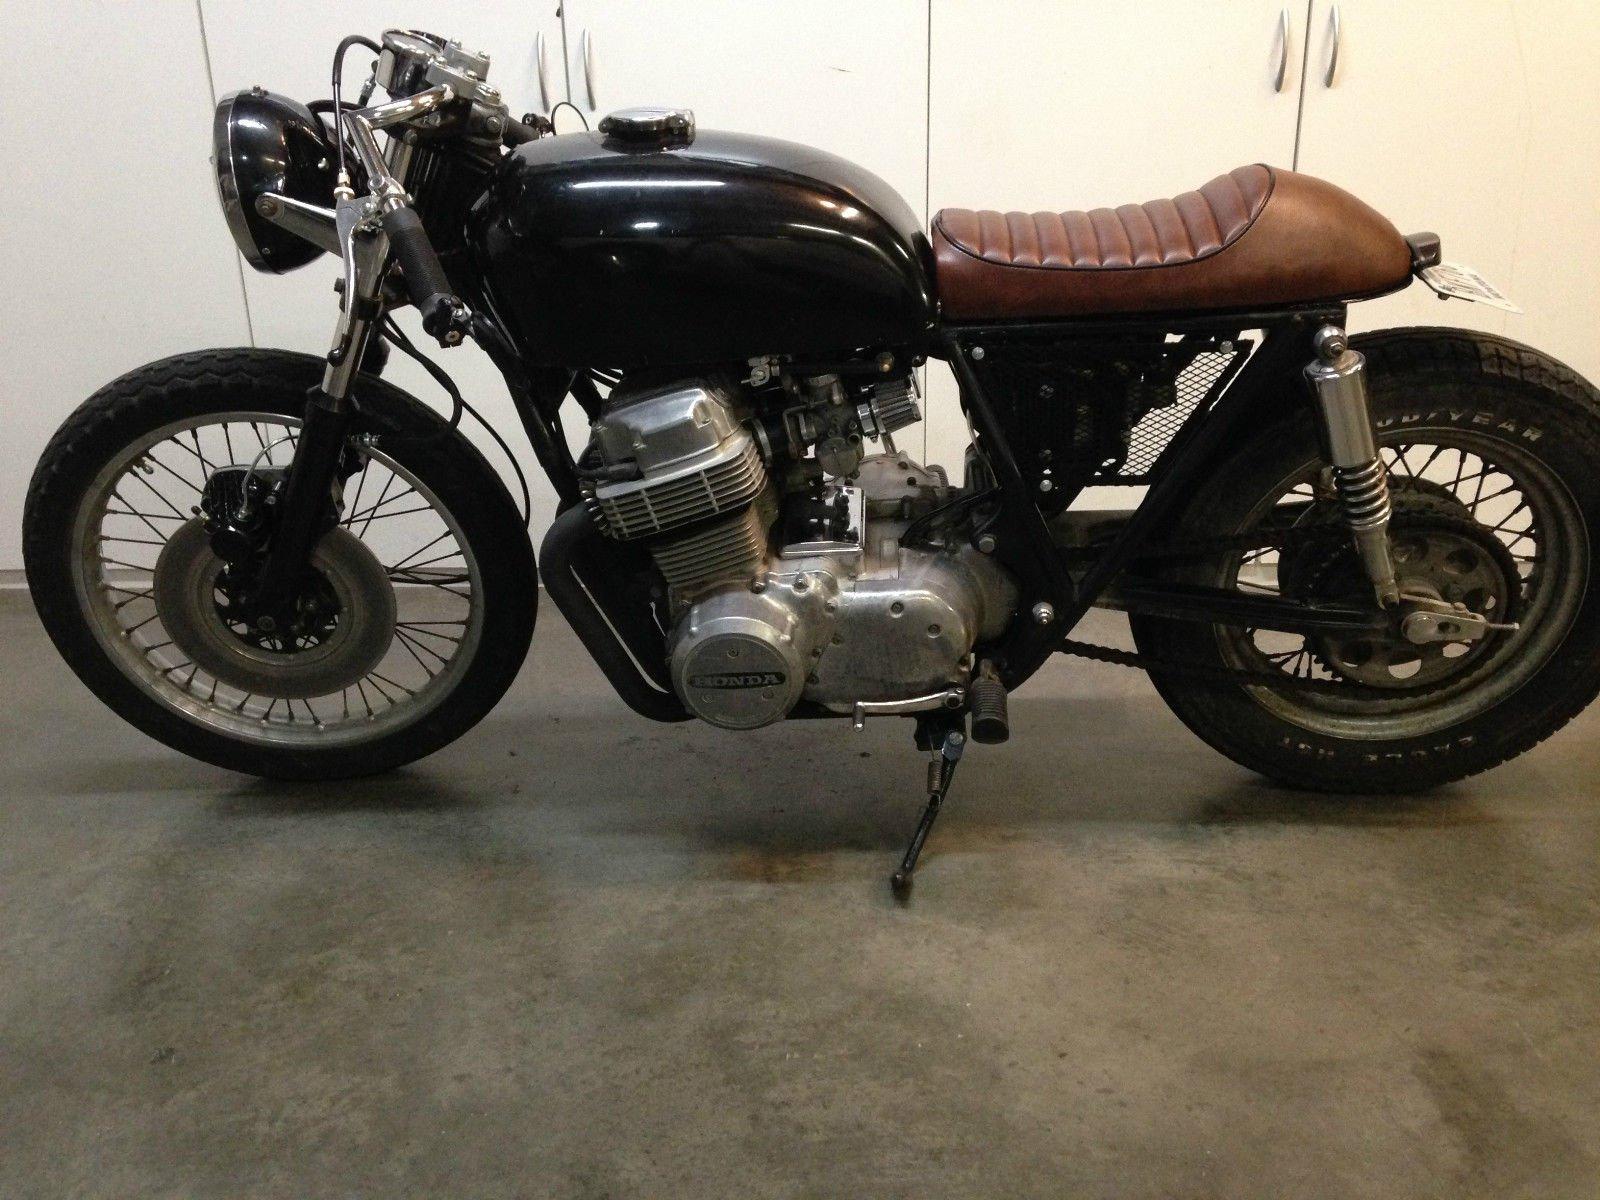 CAFE RACER Custom Bike Motorbike Motorcycle F Wallpaper